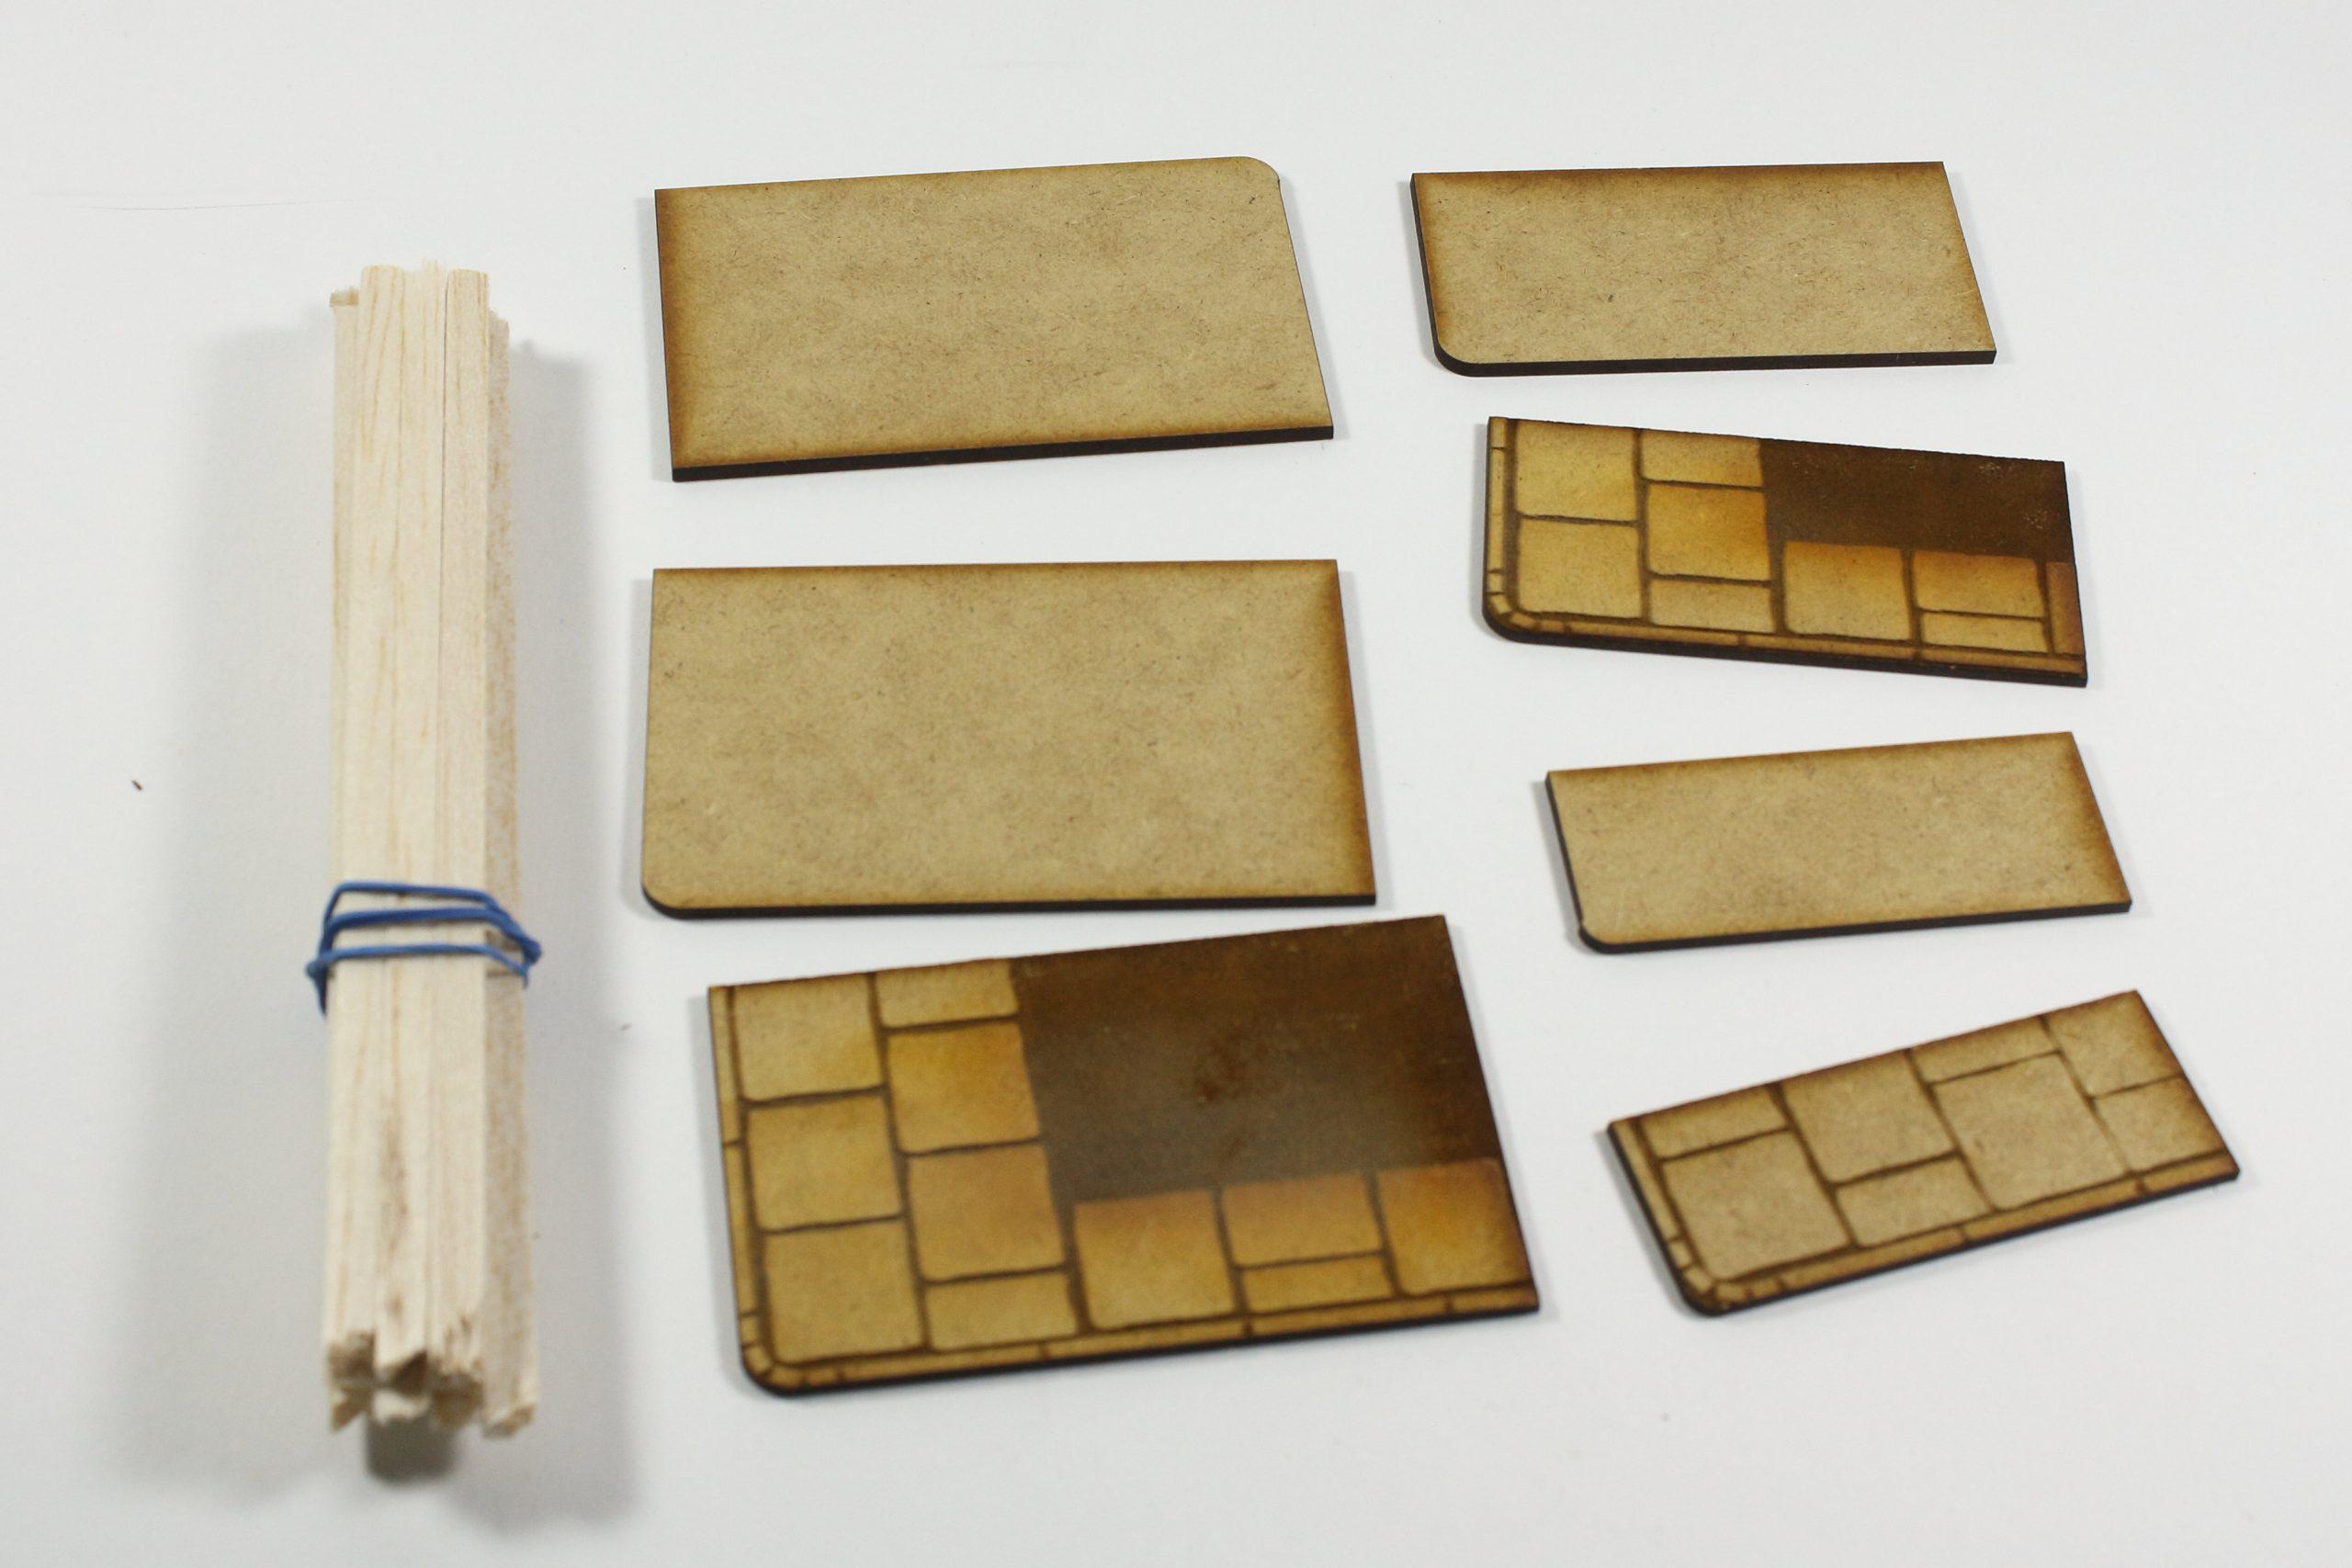 Bild-7-scaled Fachwerkhaus mit Holzschuppen - Lasercut Modellbaushop 1:35